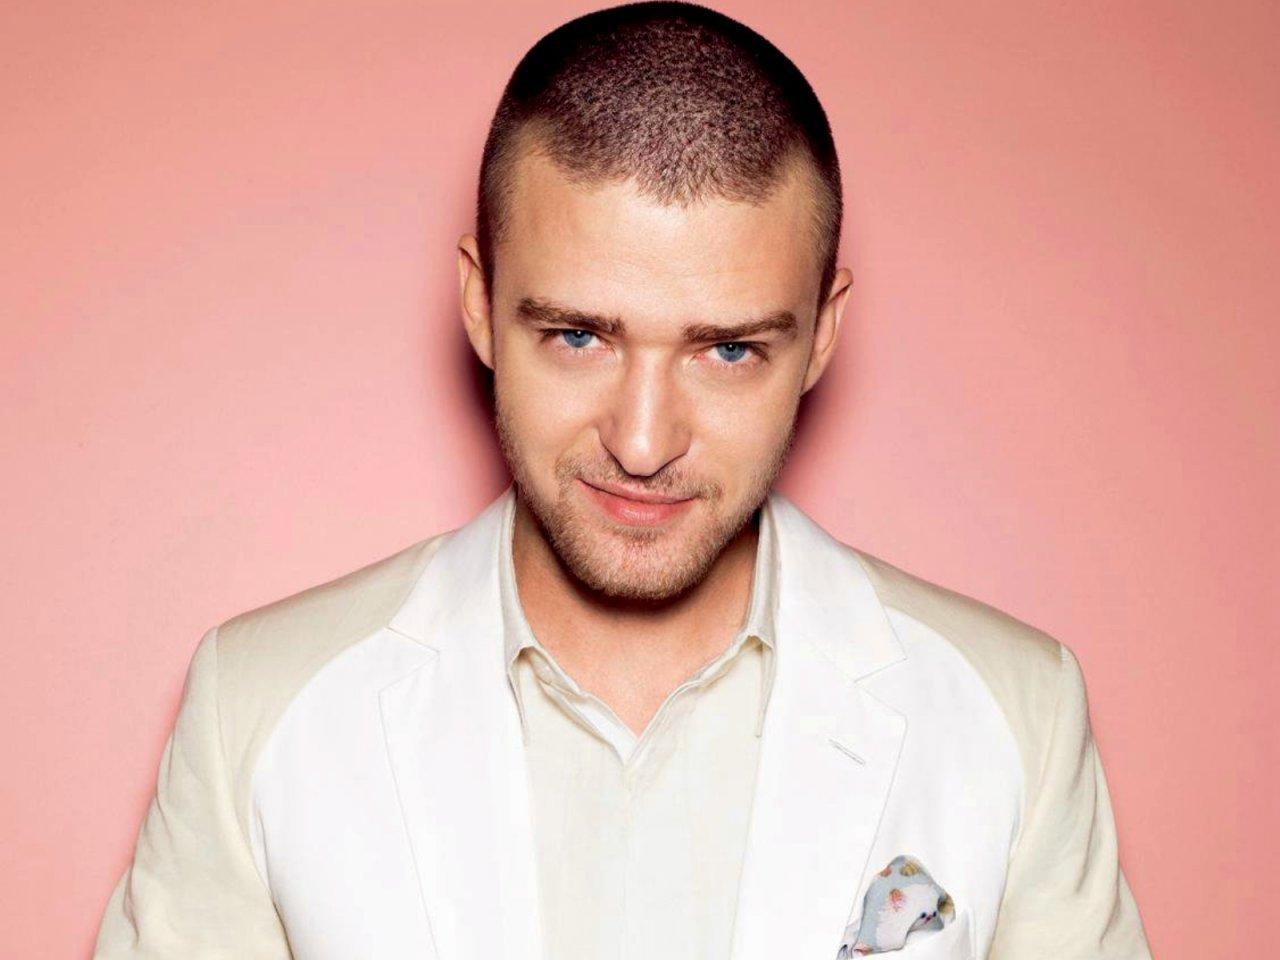 J.T. - Justin Timberlake Wallpaper (18476430) - Fanpop